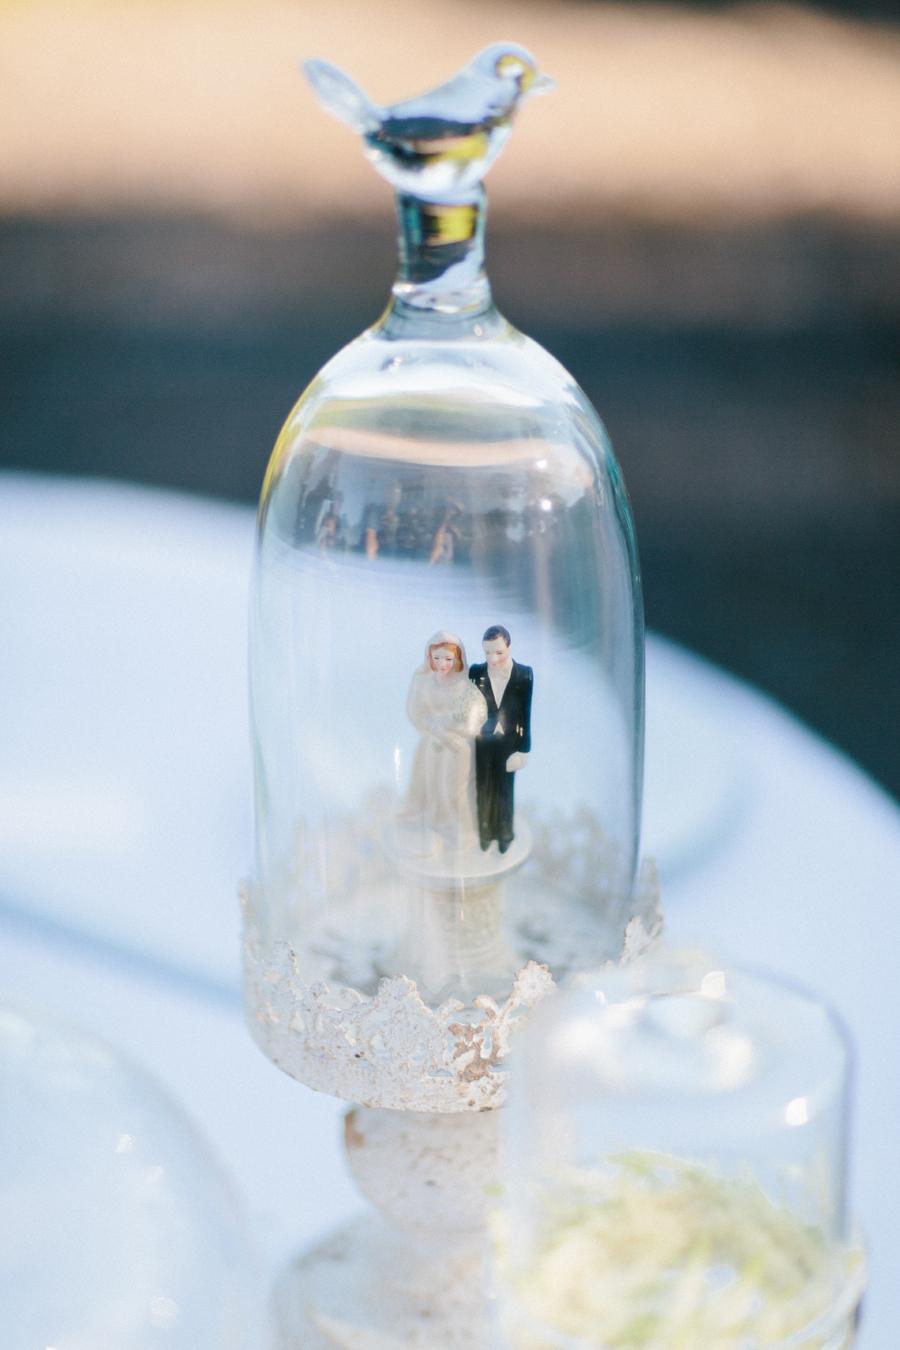 cloche wedding cake topper